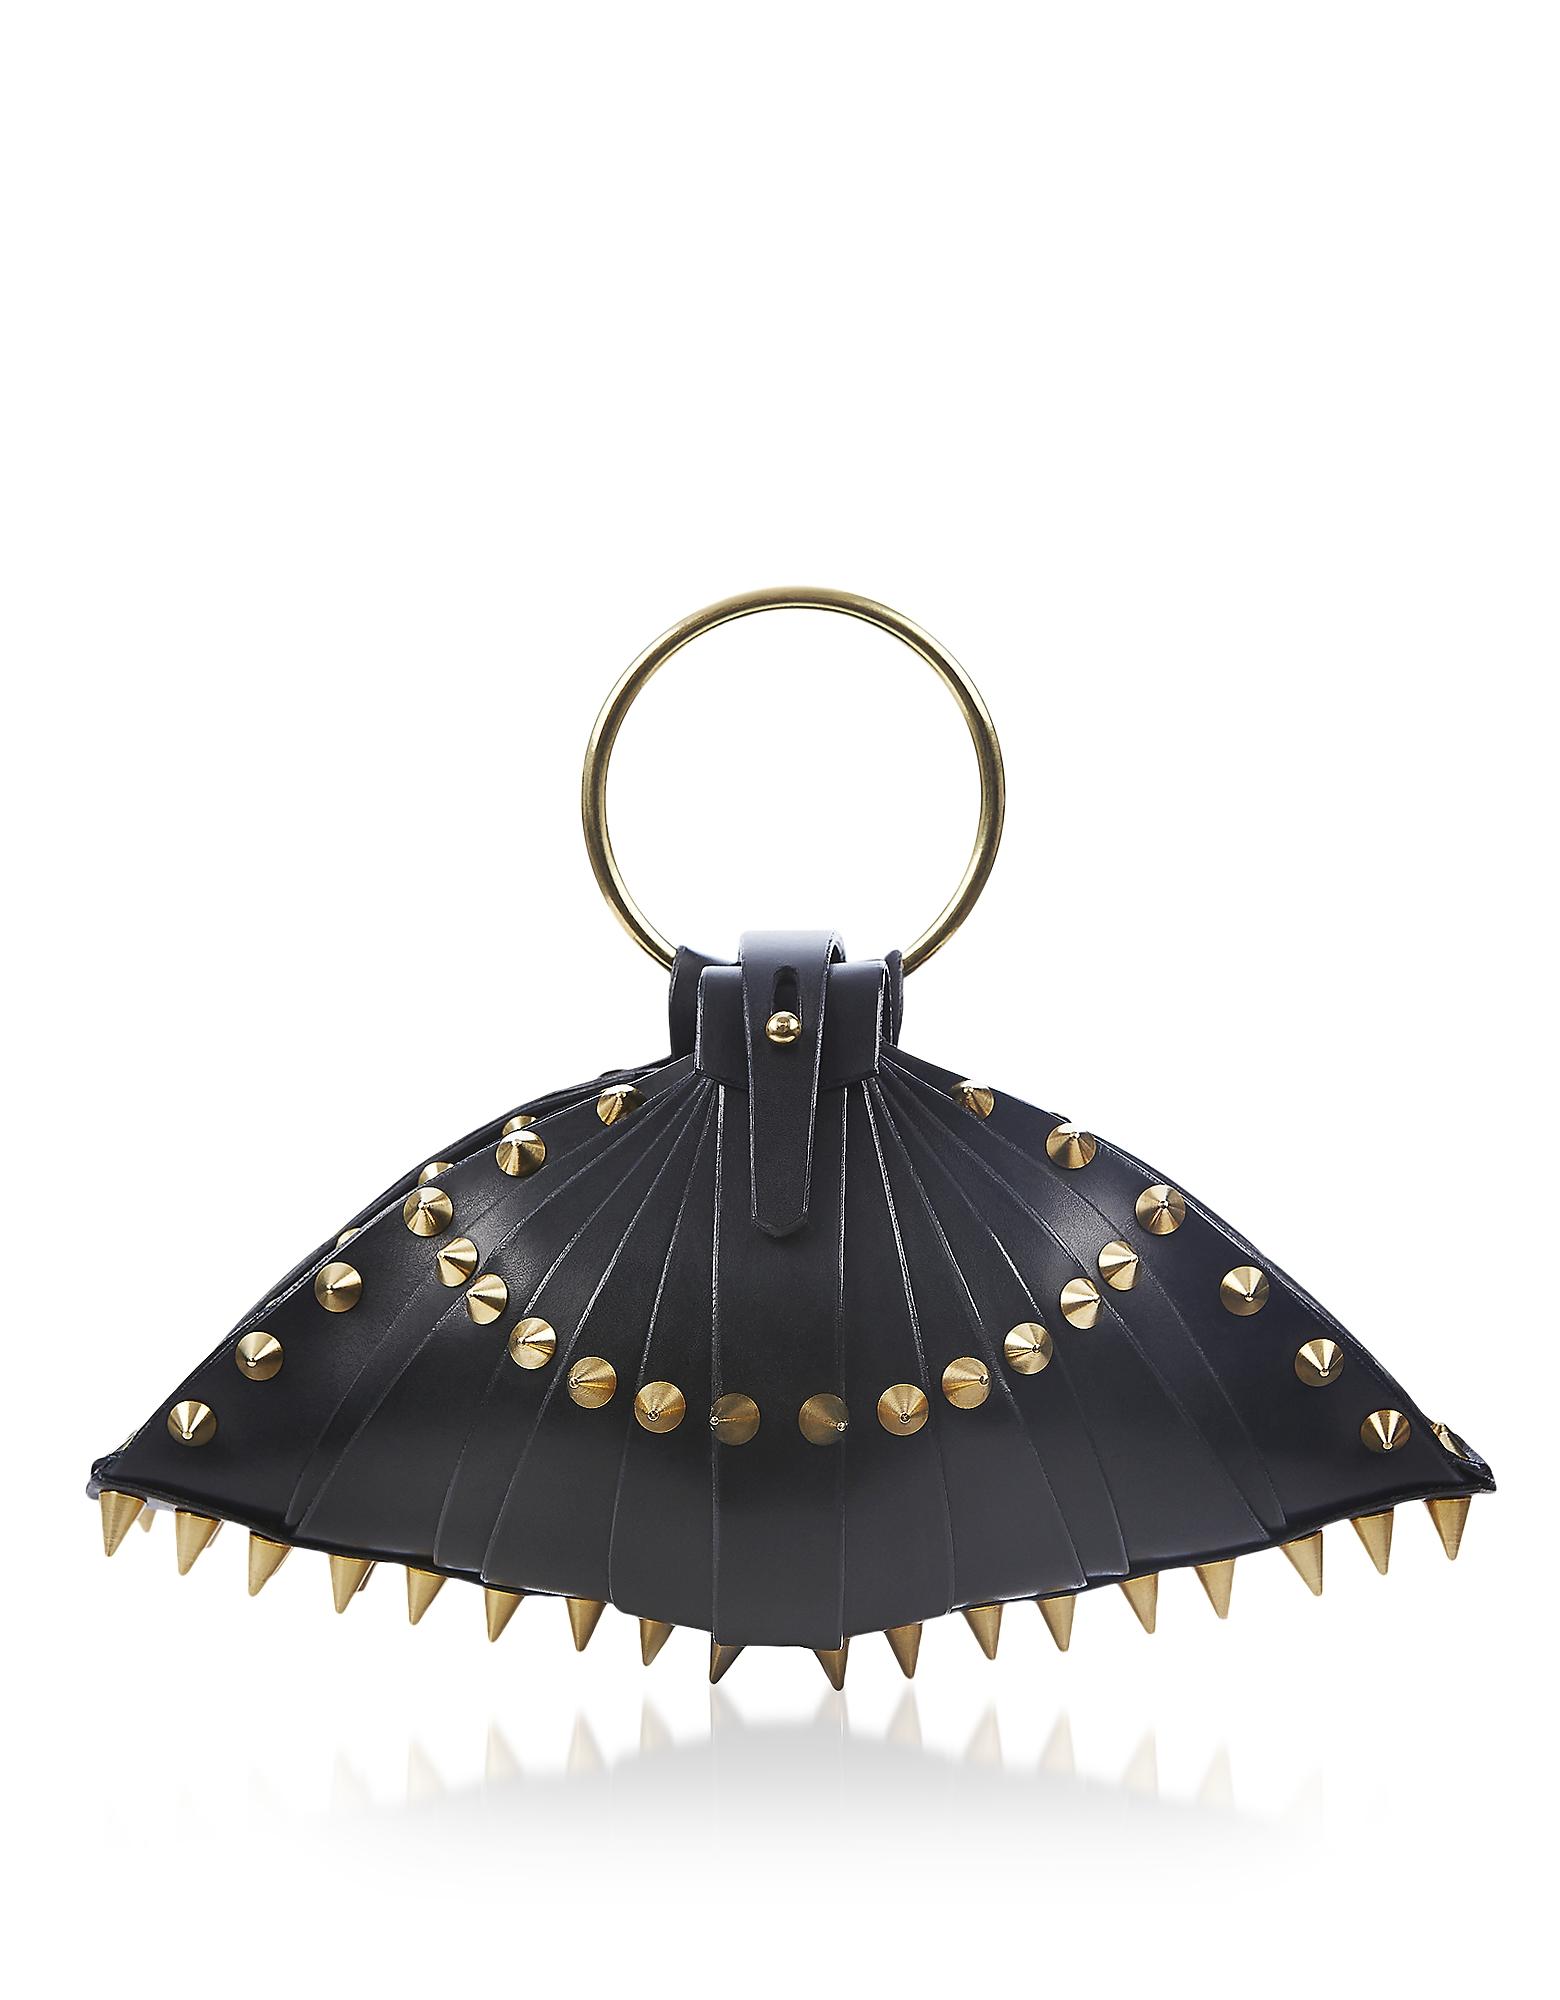 Black Leather Warrior Shell Bag